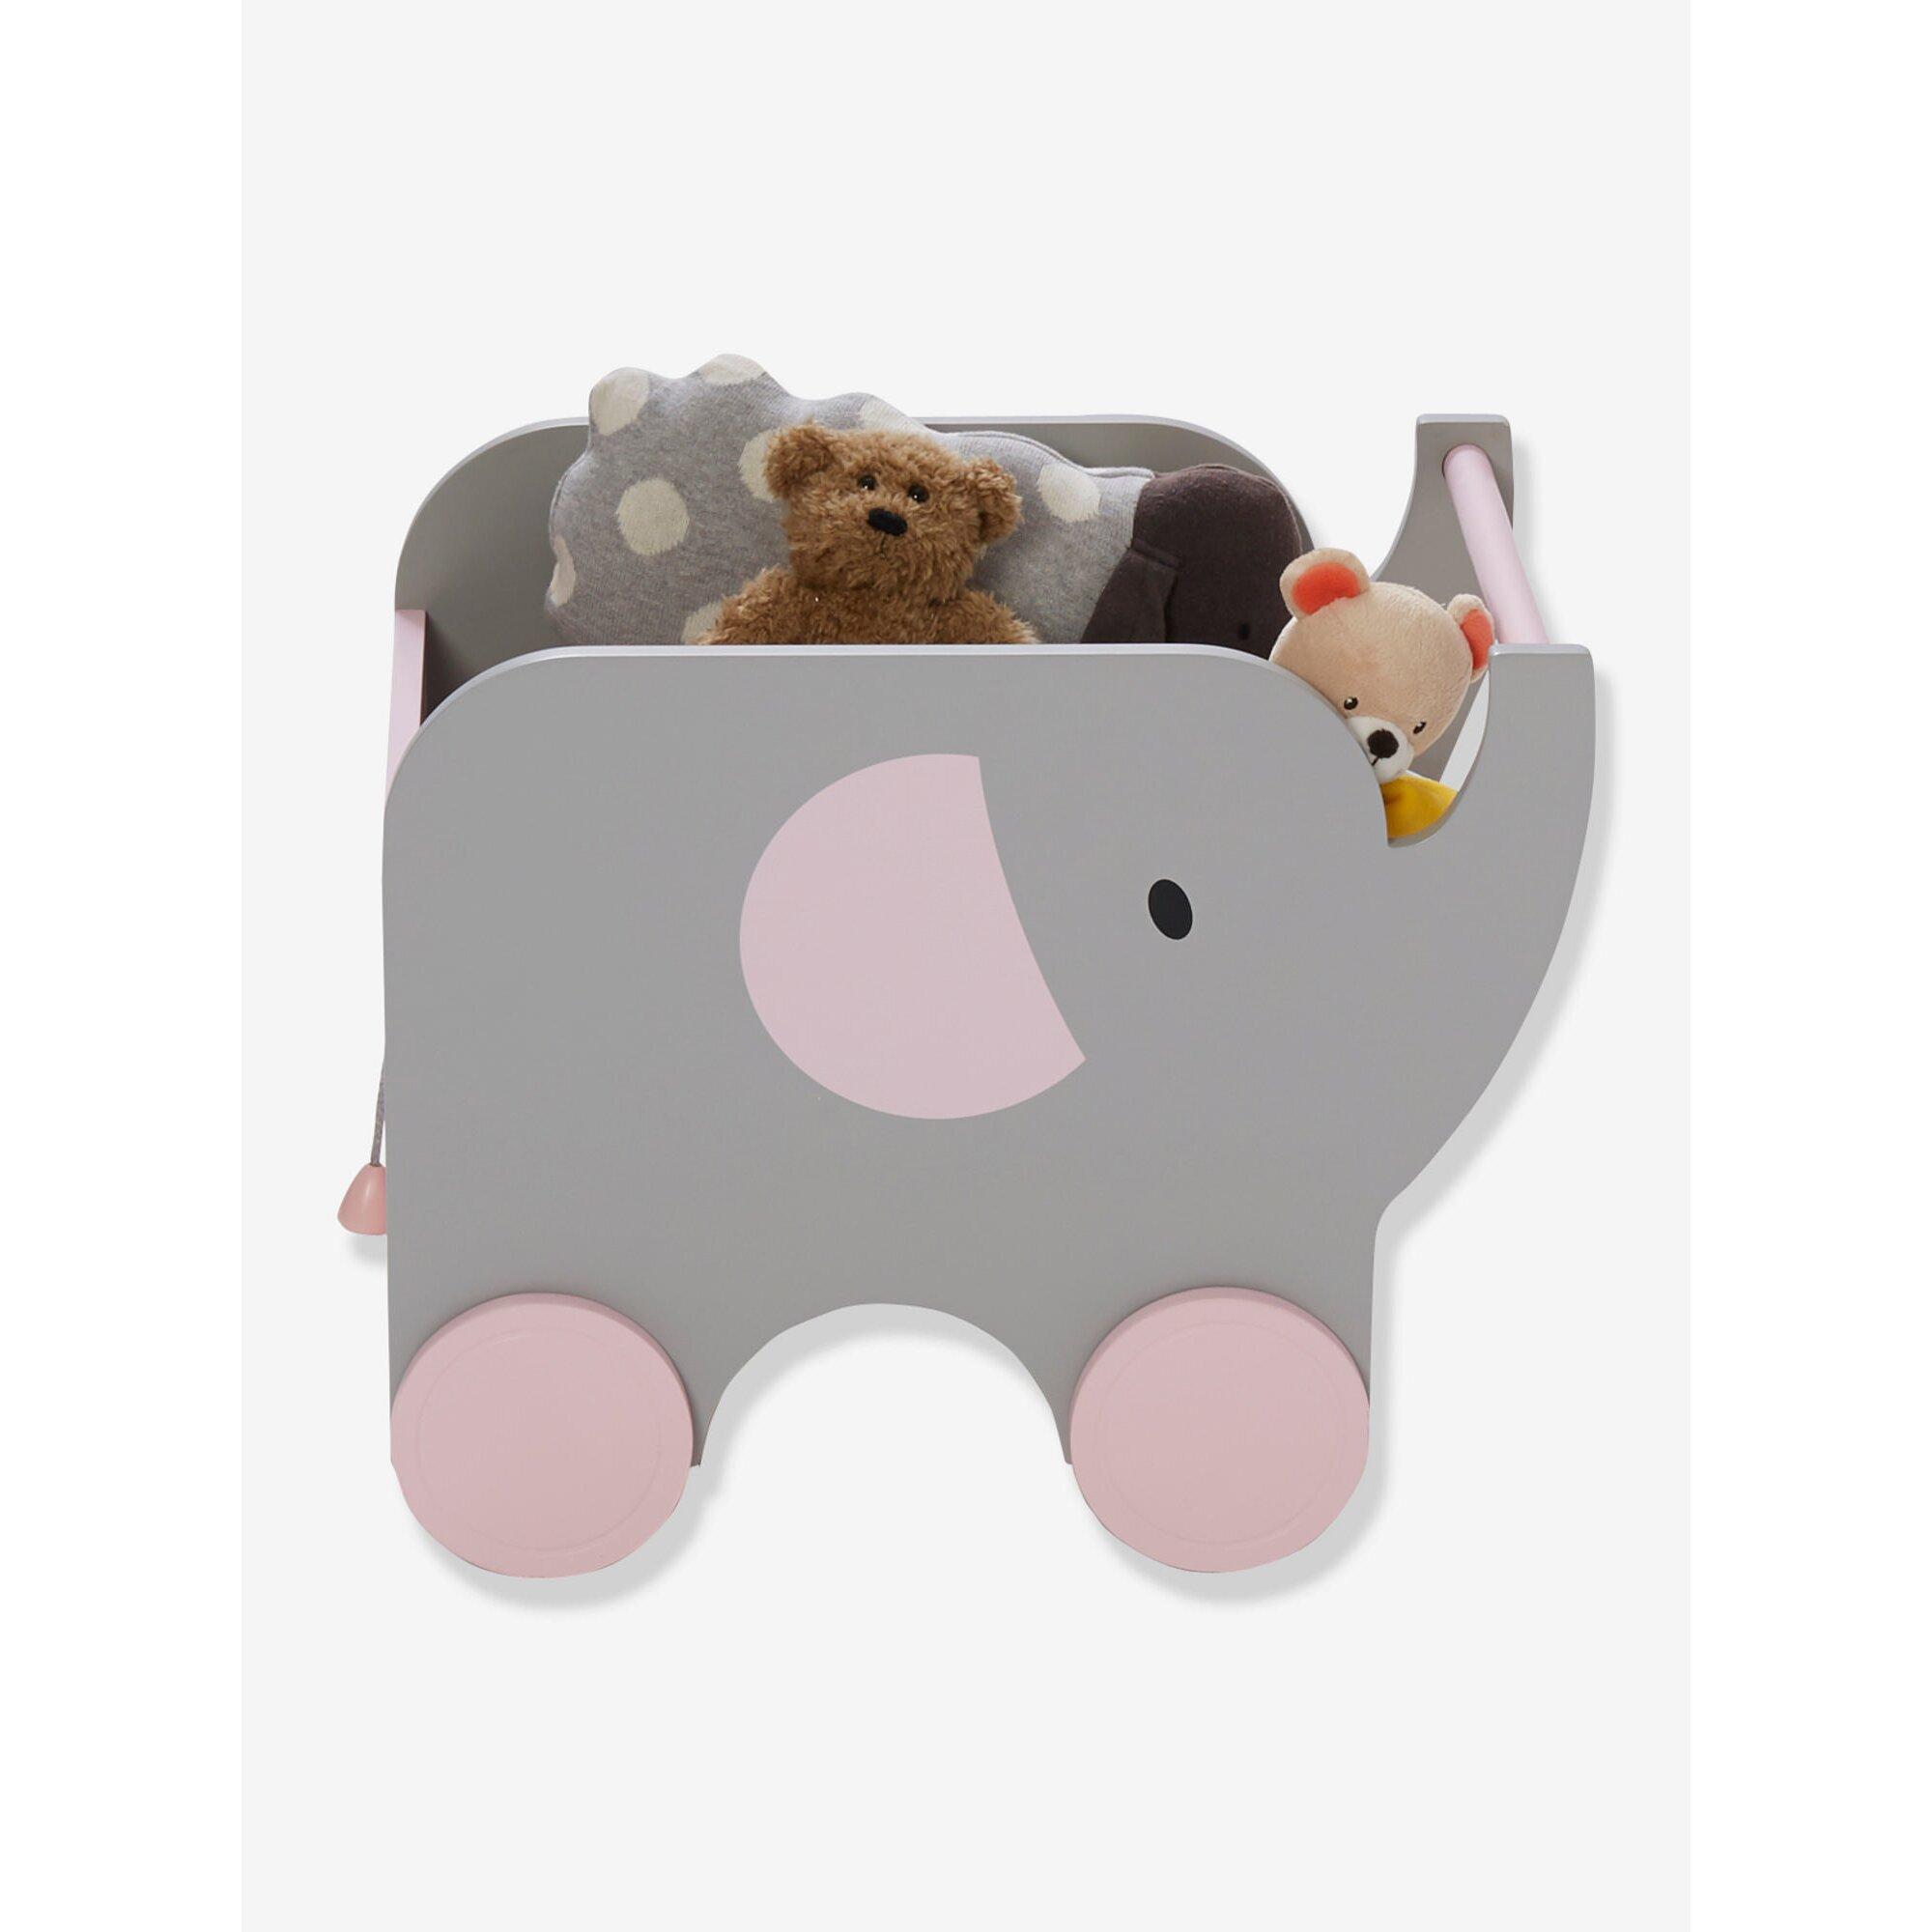 vertbaudet-fahrbare-spielzeugkiste-elefant-